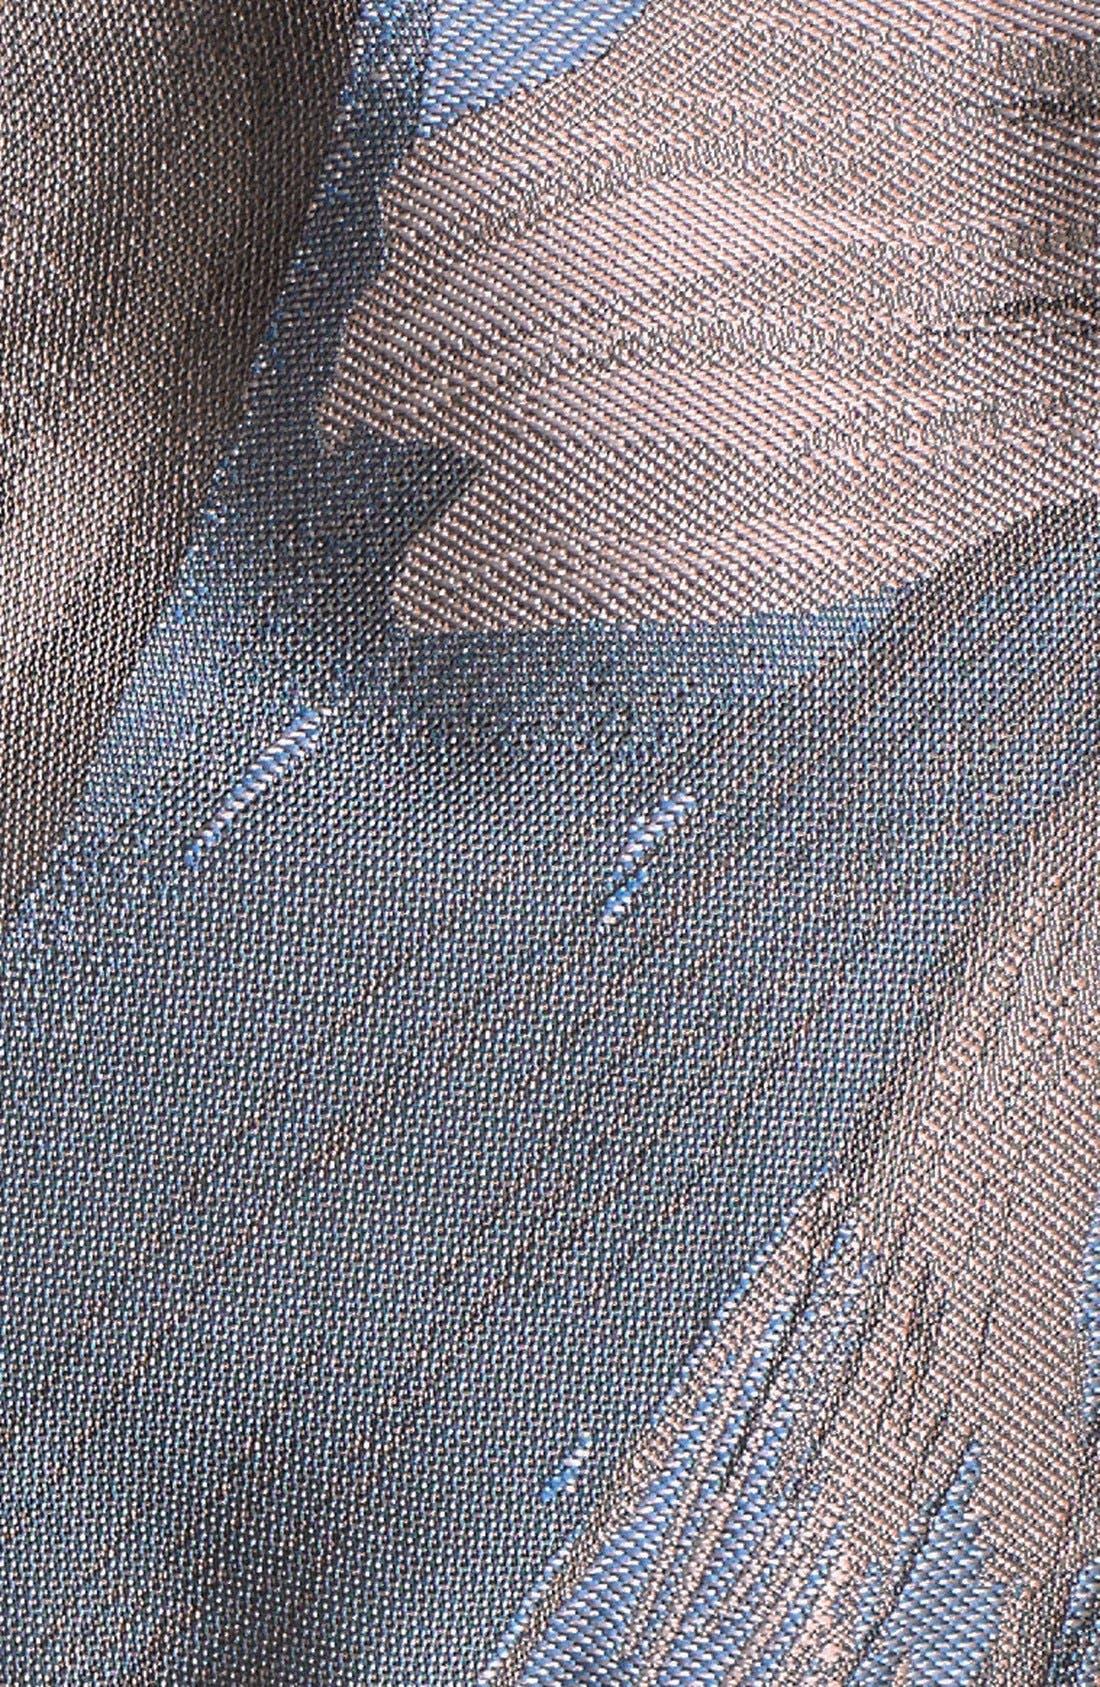 Alternate Image 6  - Maggy London 'Splash' Floral Jacquard Sheath Dress (Regular & Petite)